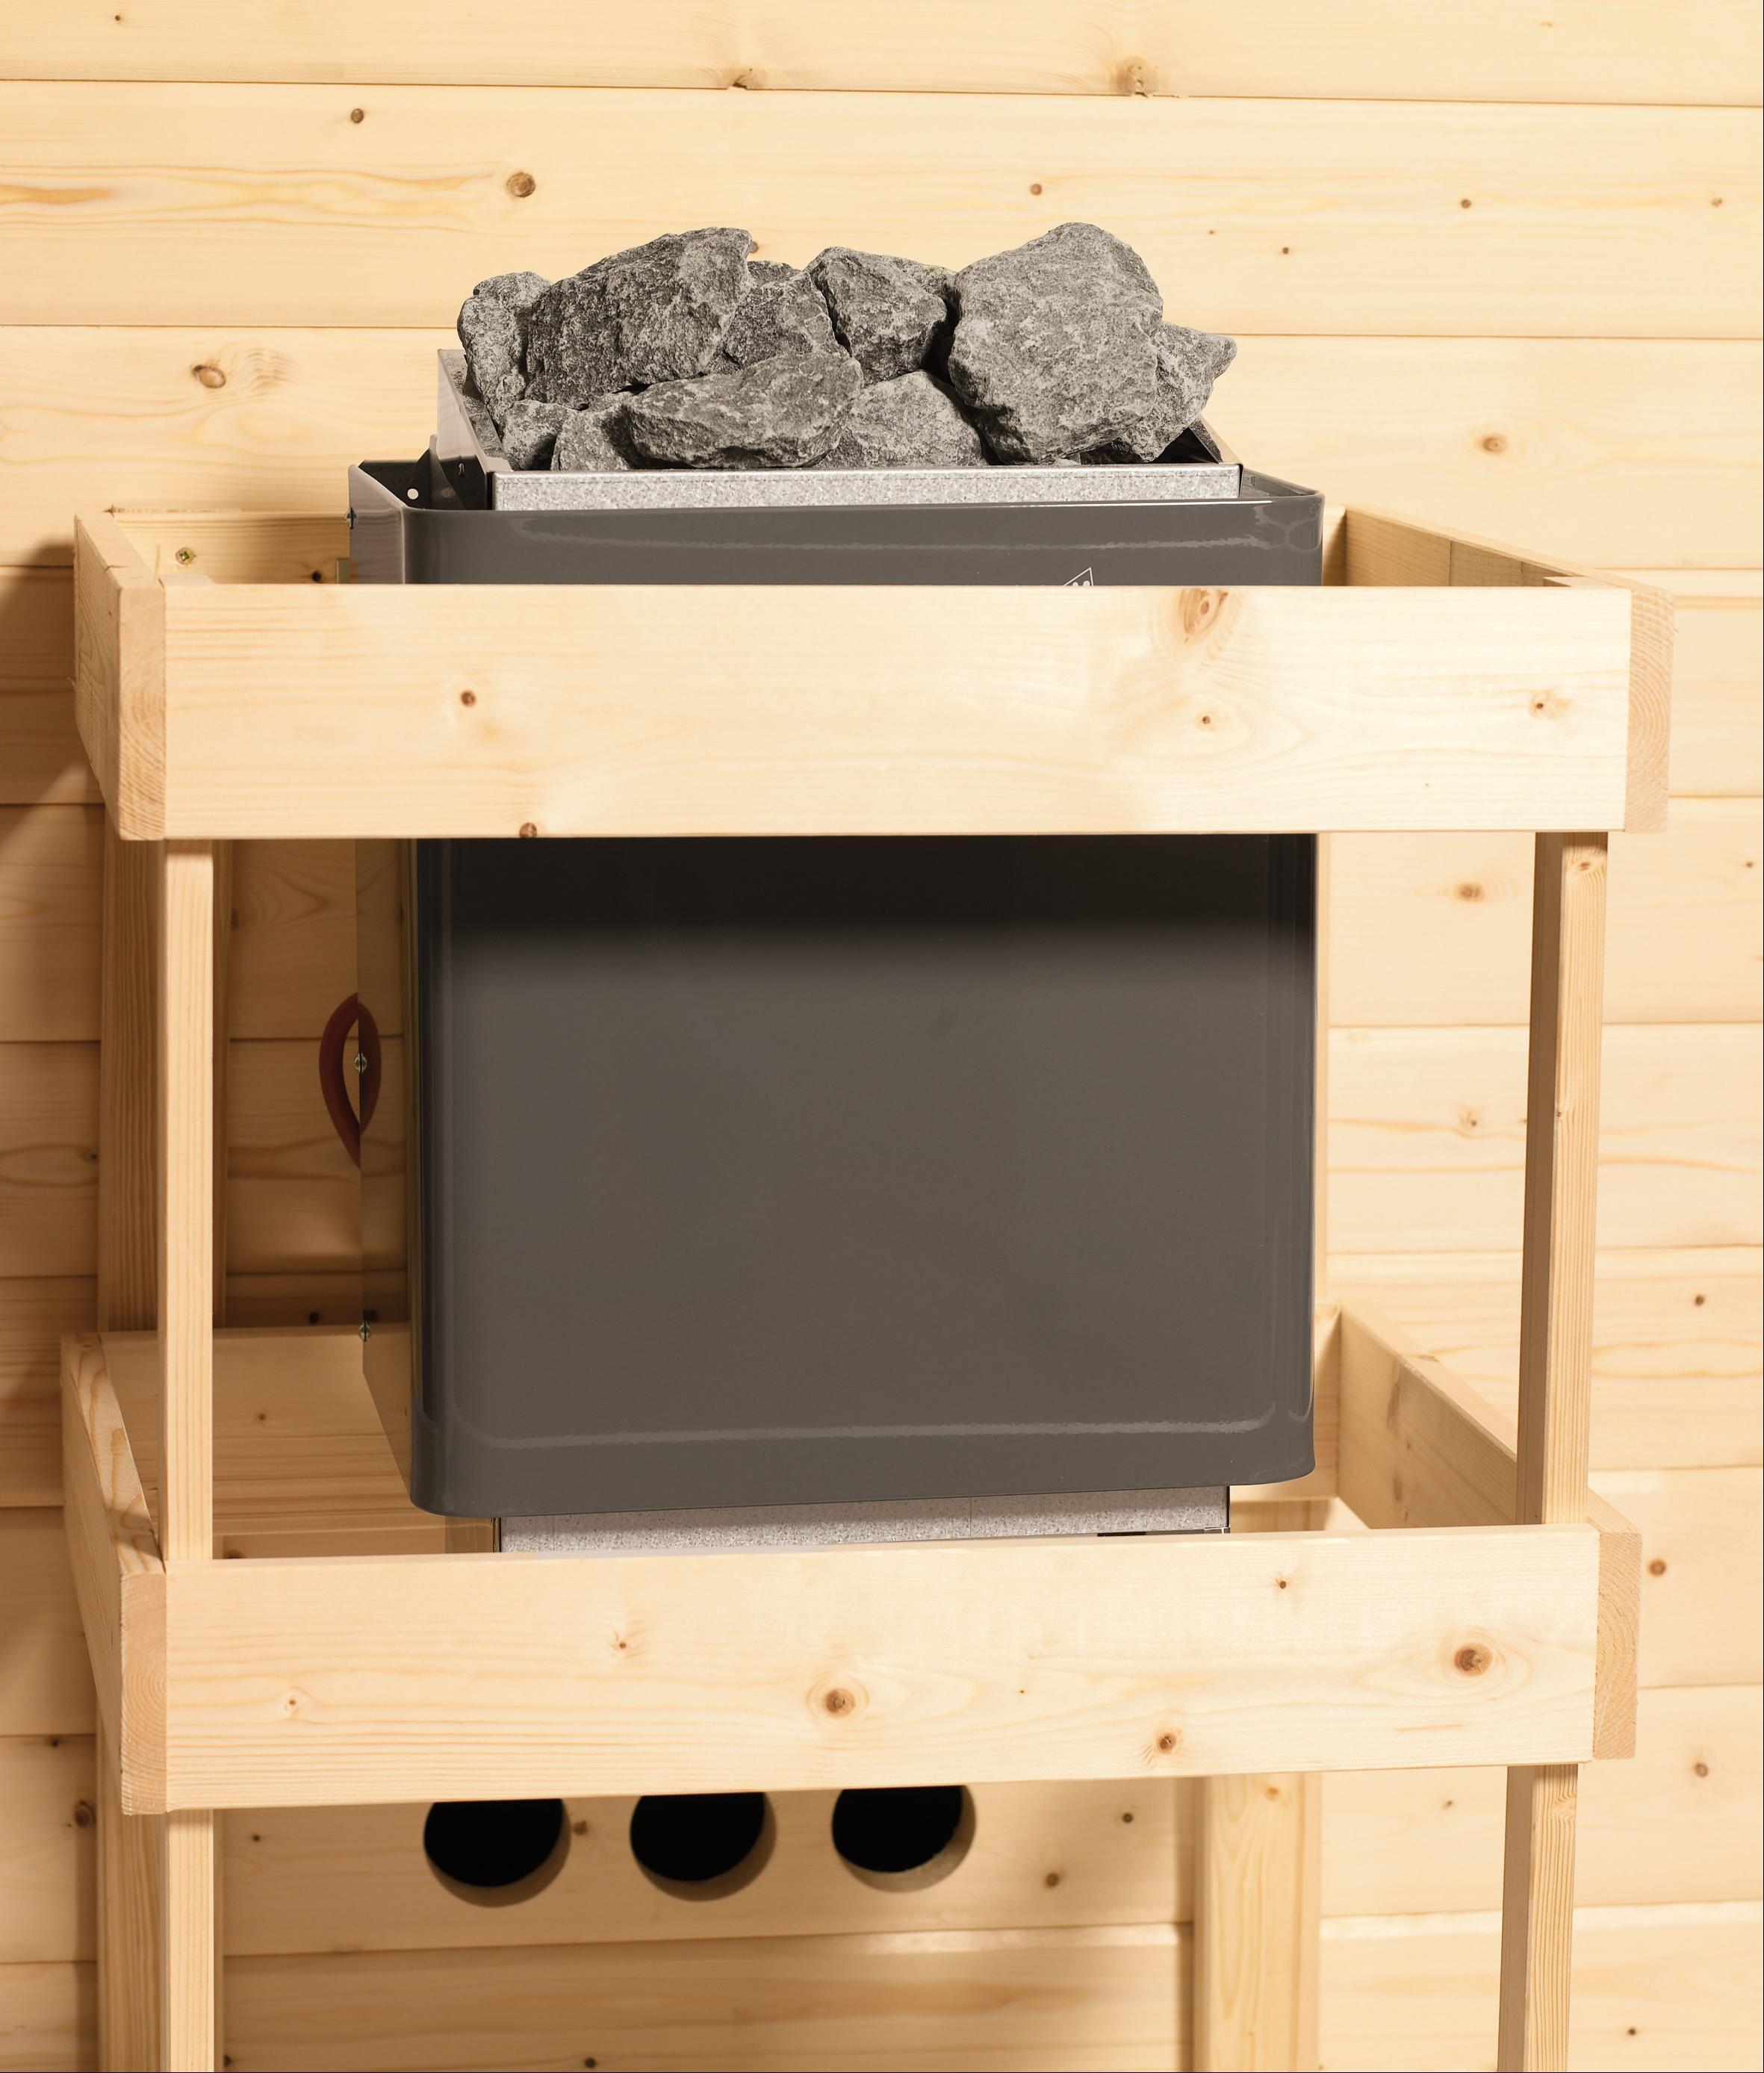 Woodfeeling Sauna Leona 38mm Ofen Bio 9kW Tür Modern Bild 9